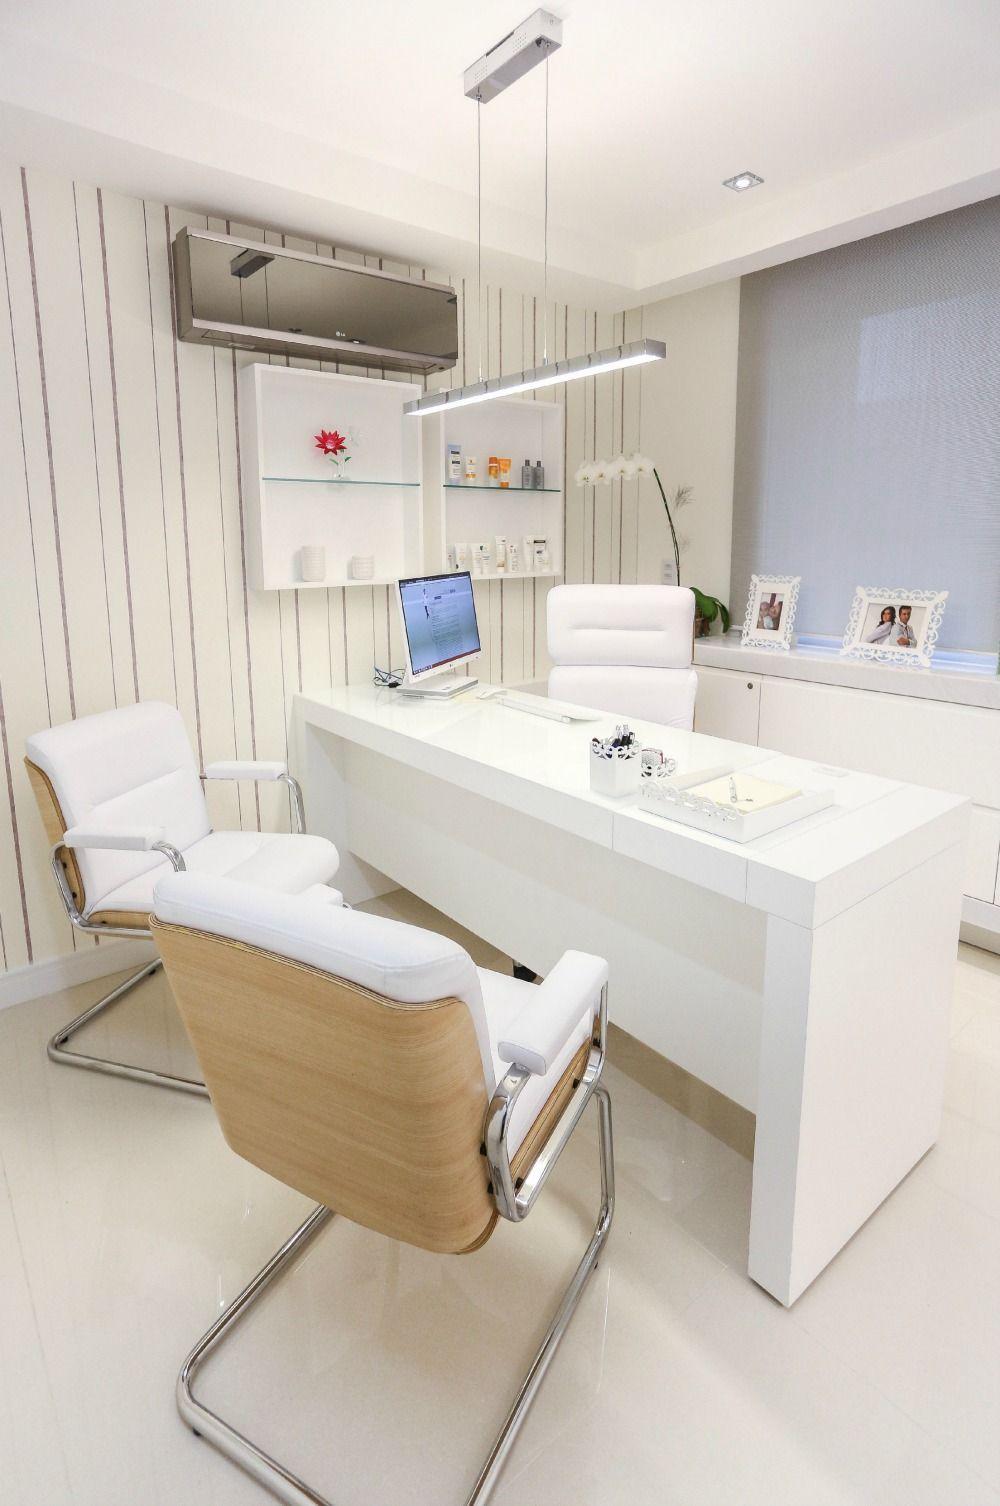 Cadeira De Escritório 60 Ideias Modelos E Tipos Para Comprar Office Table